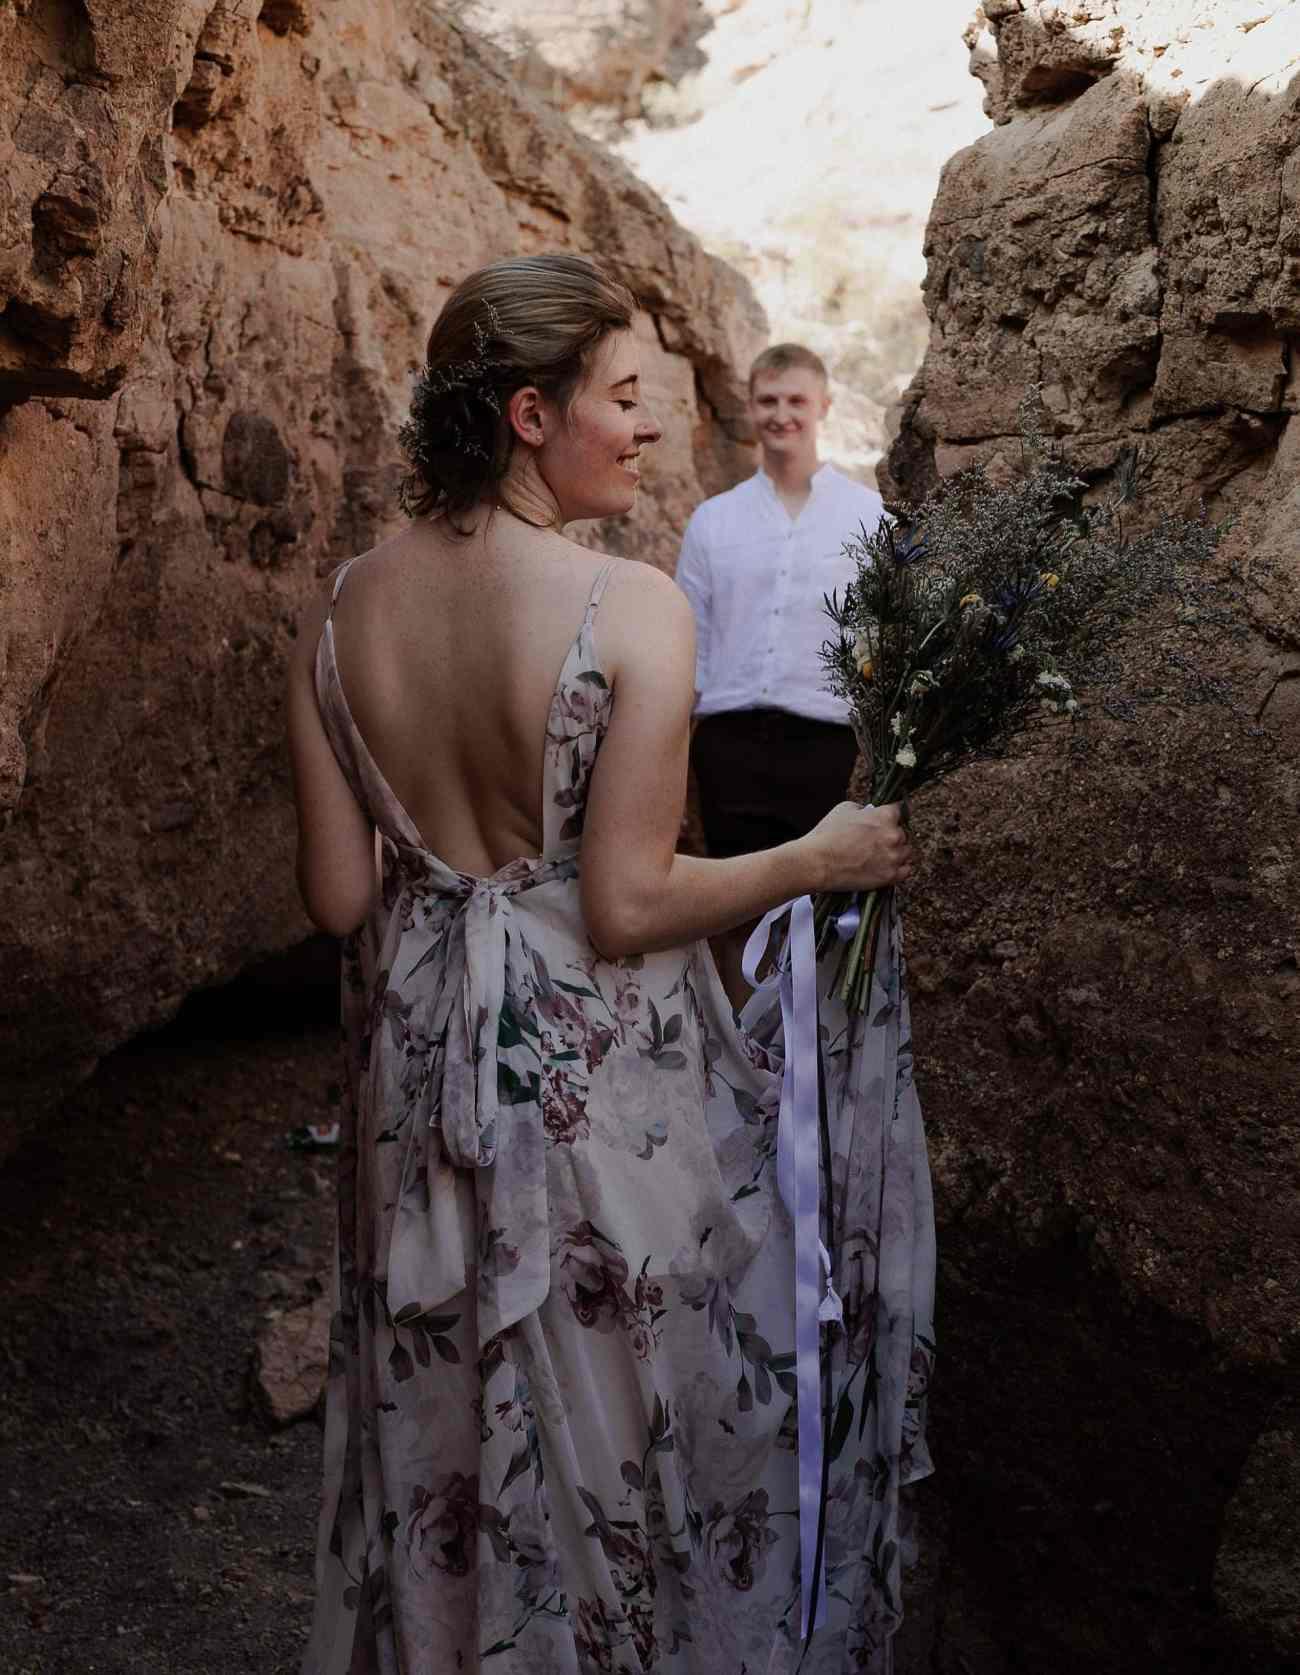 Bride and groom walk through cliffs at Nelson's Landing